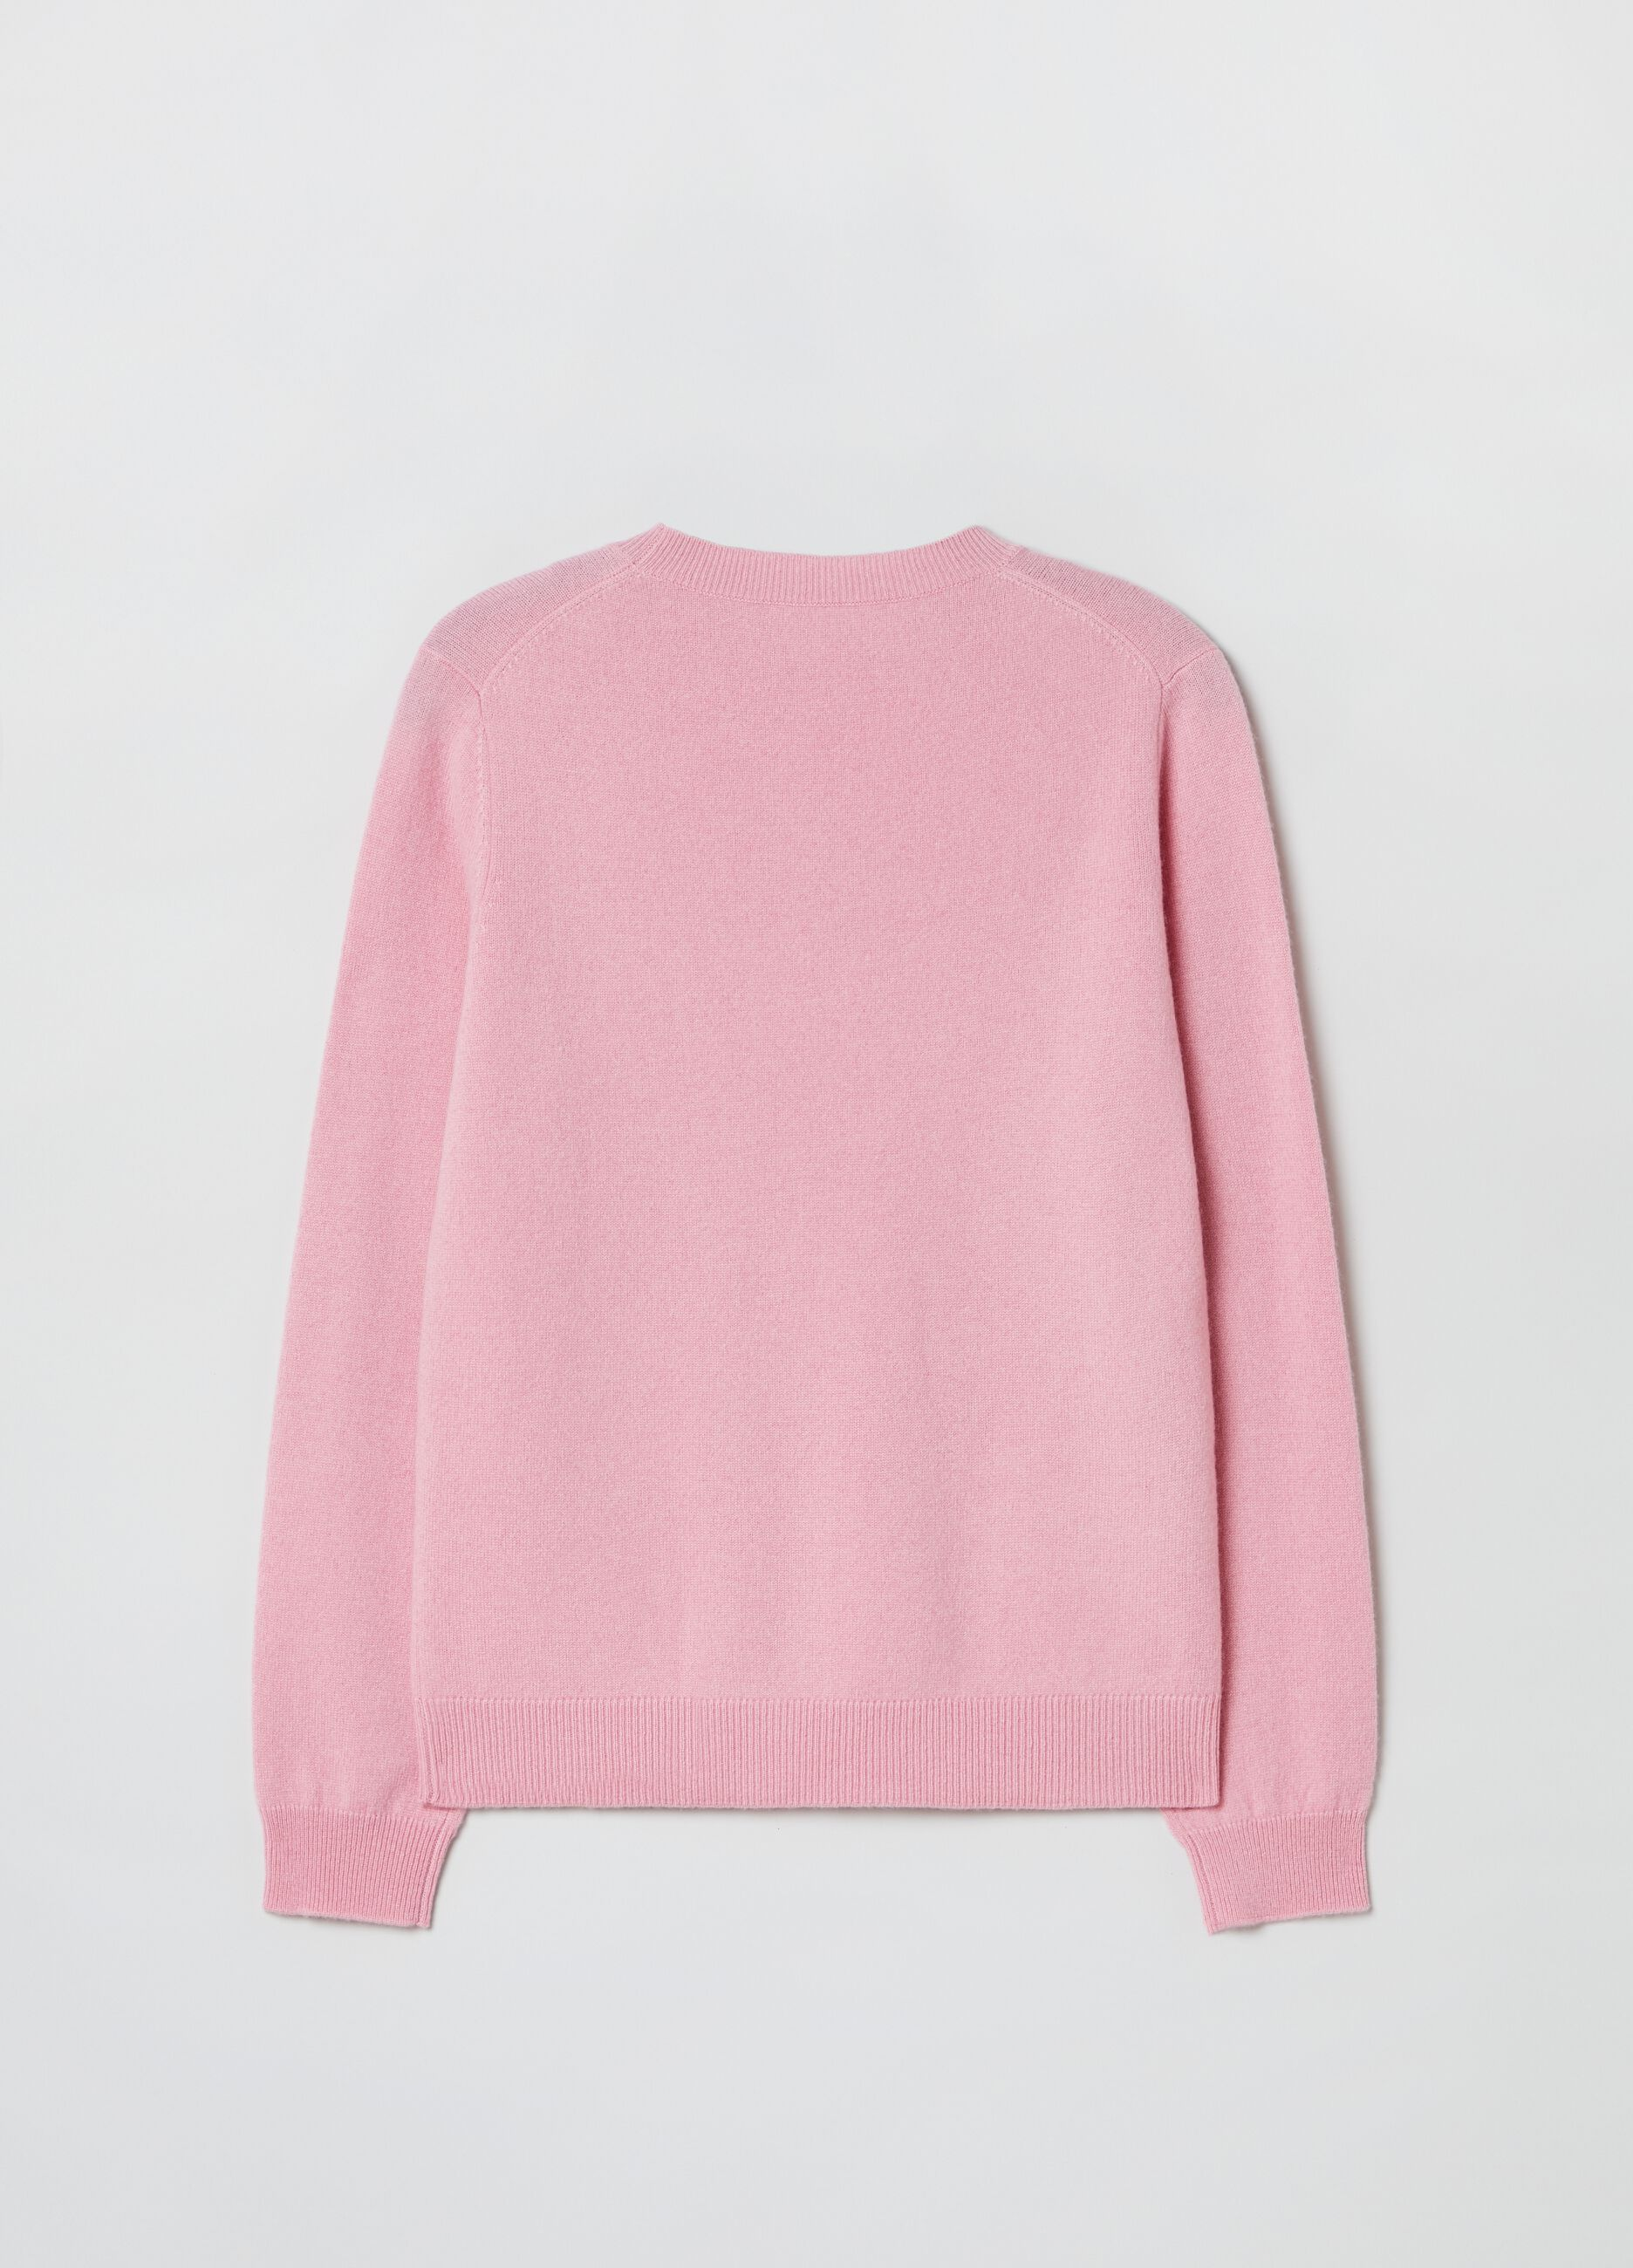 Round-neck pullover in 100% cashmere Pink